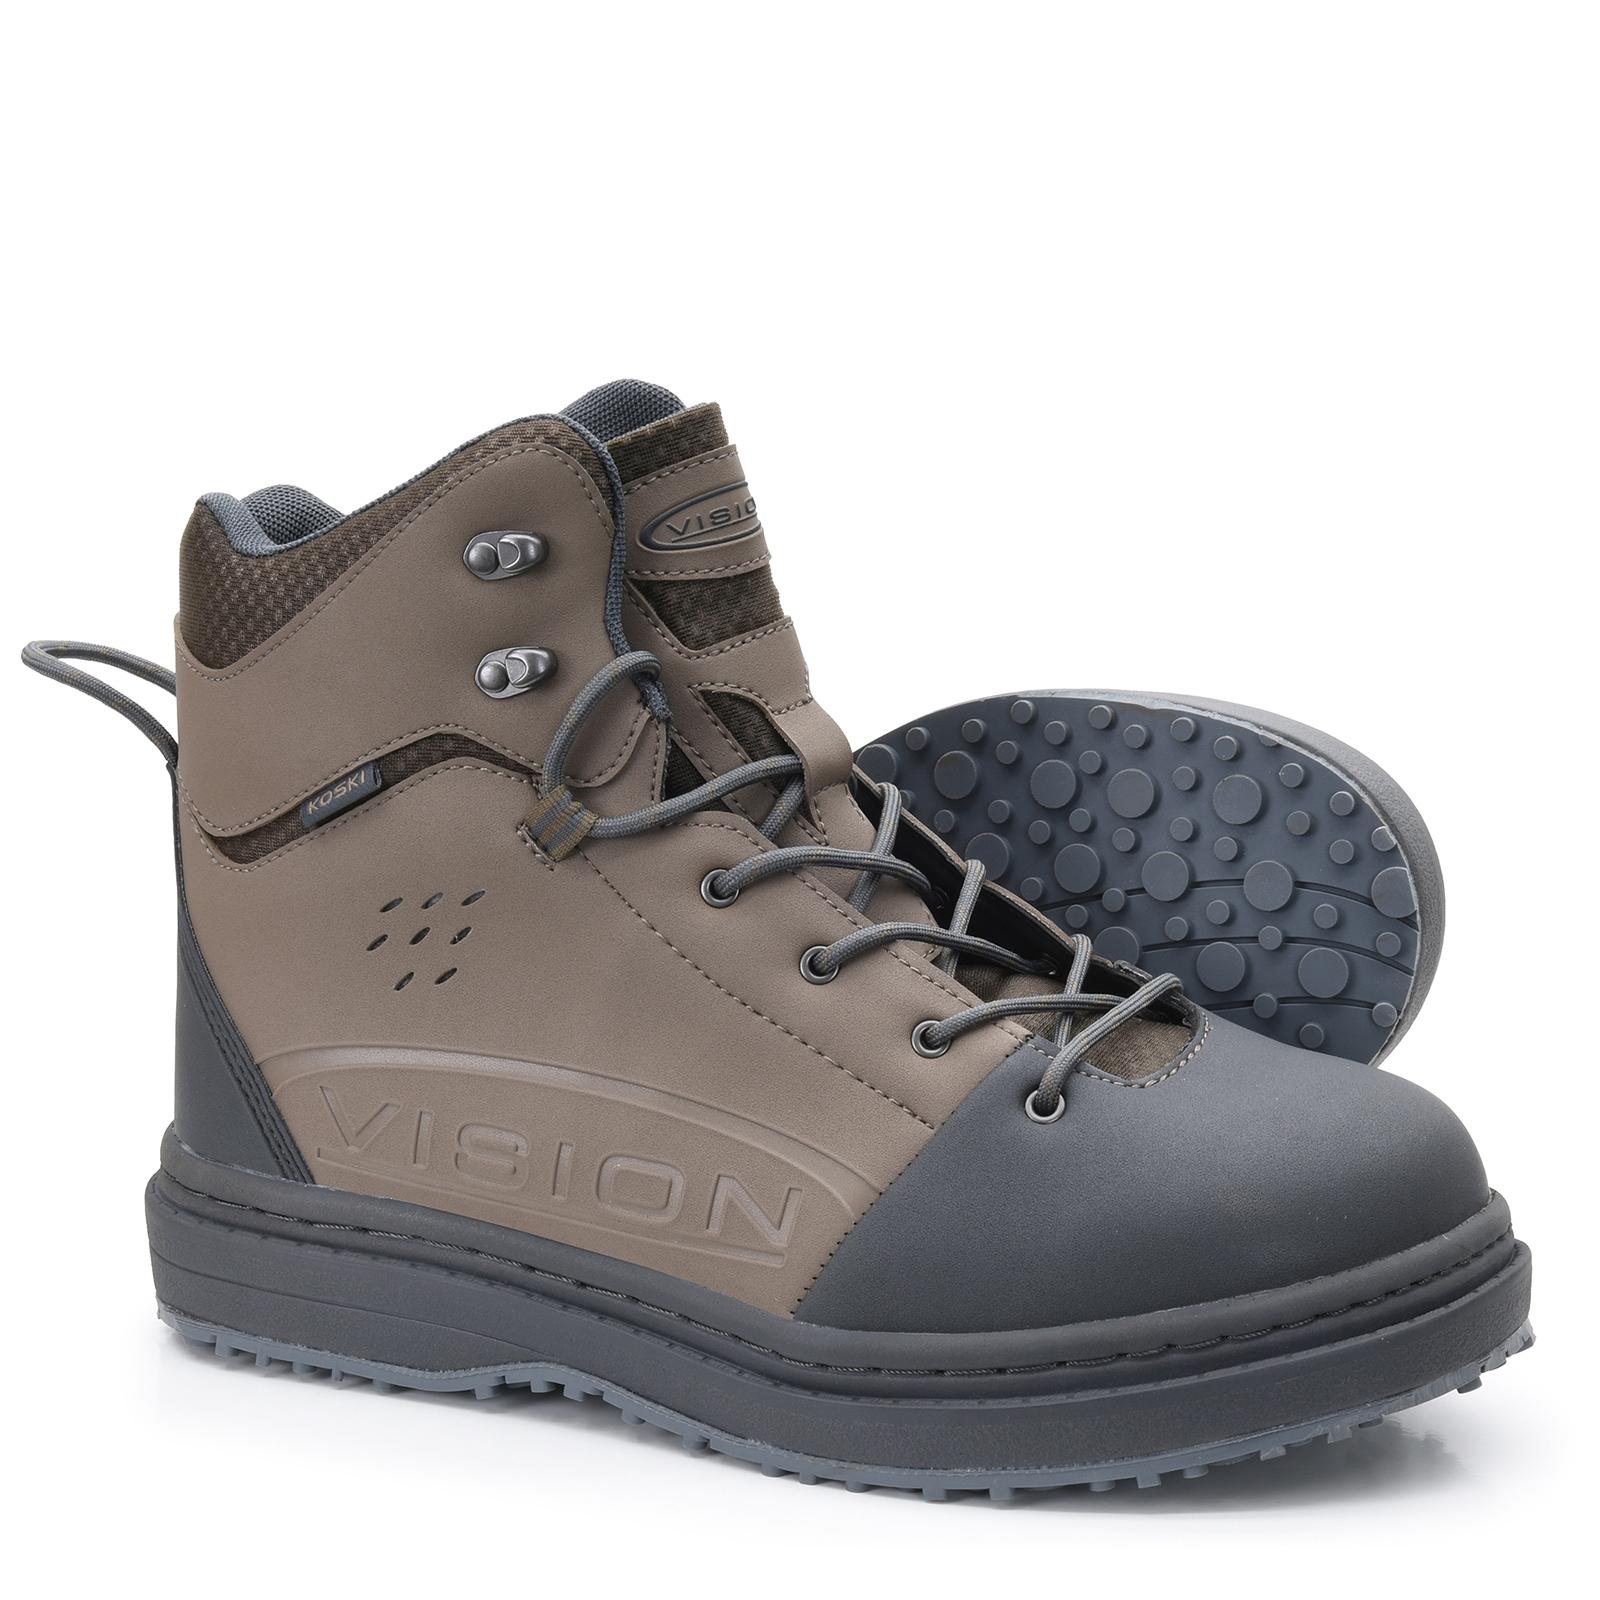 Koski Gummi Boot